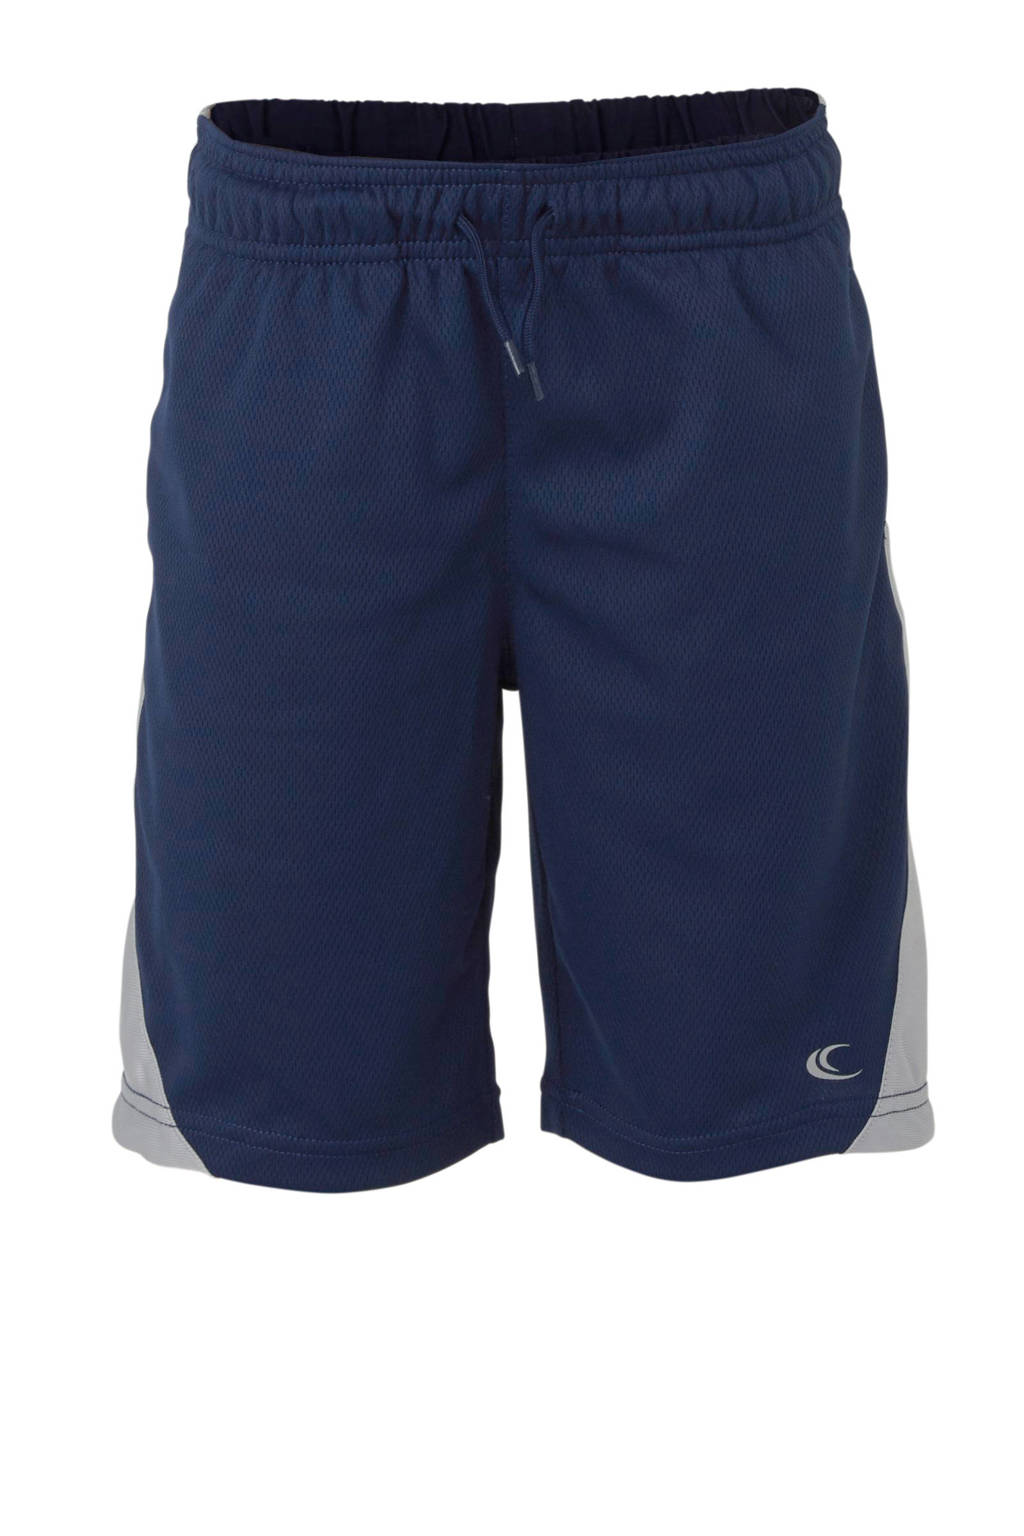 Carter's   sportshort blauw, Donkerblauw